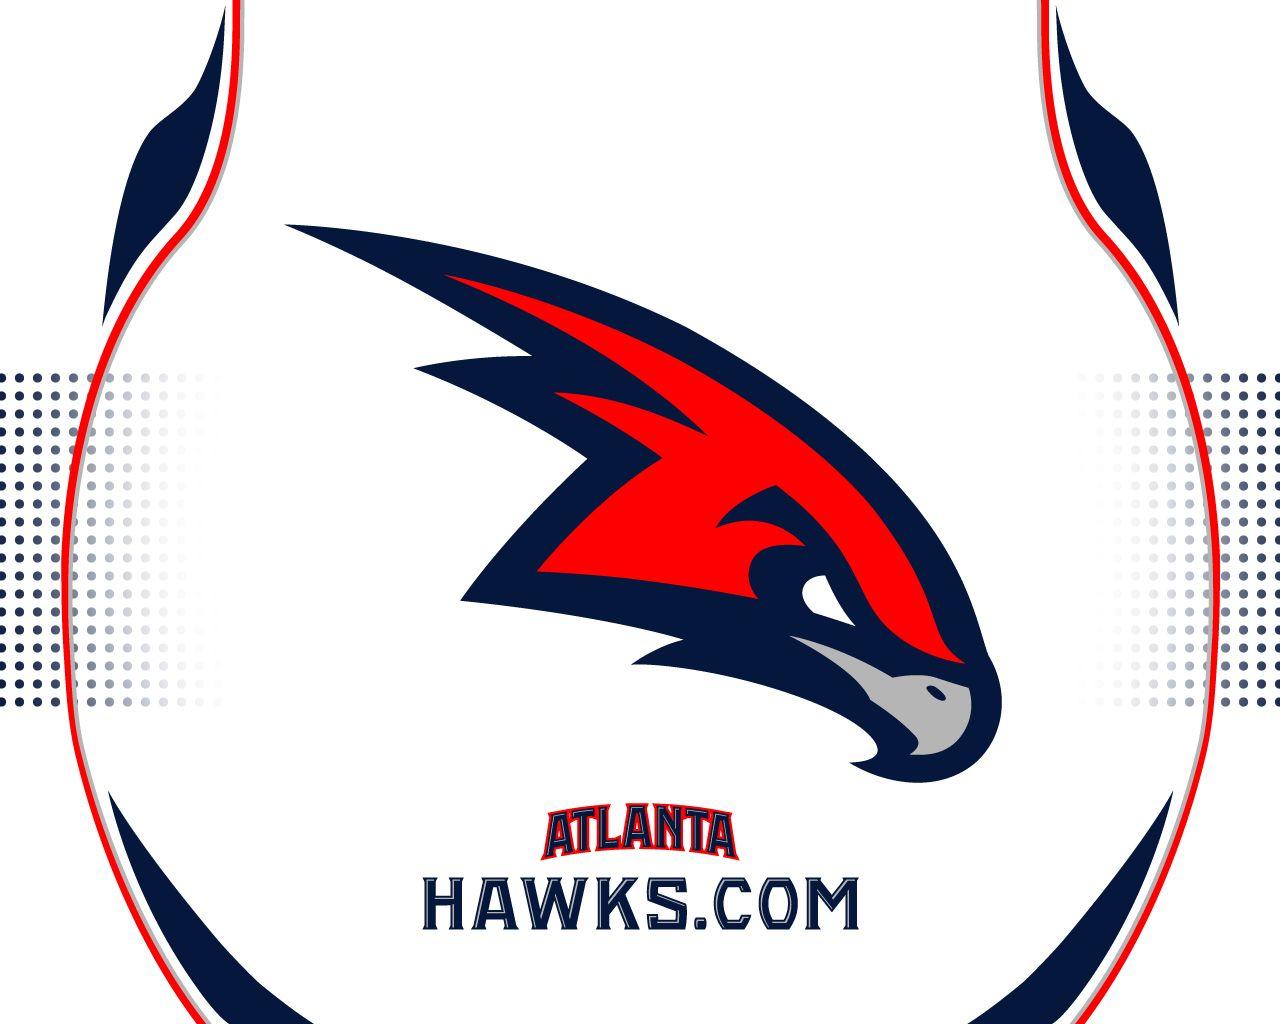 Google chrome themes jesus christ - Atlanta Hawks Wallpapers Chrome Themes More For The Biggest Fans Brand Thunder